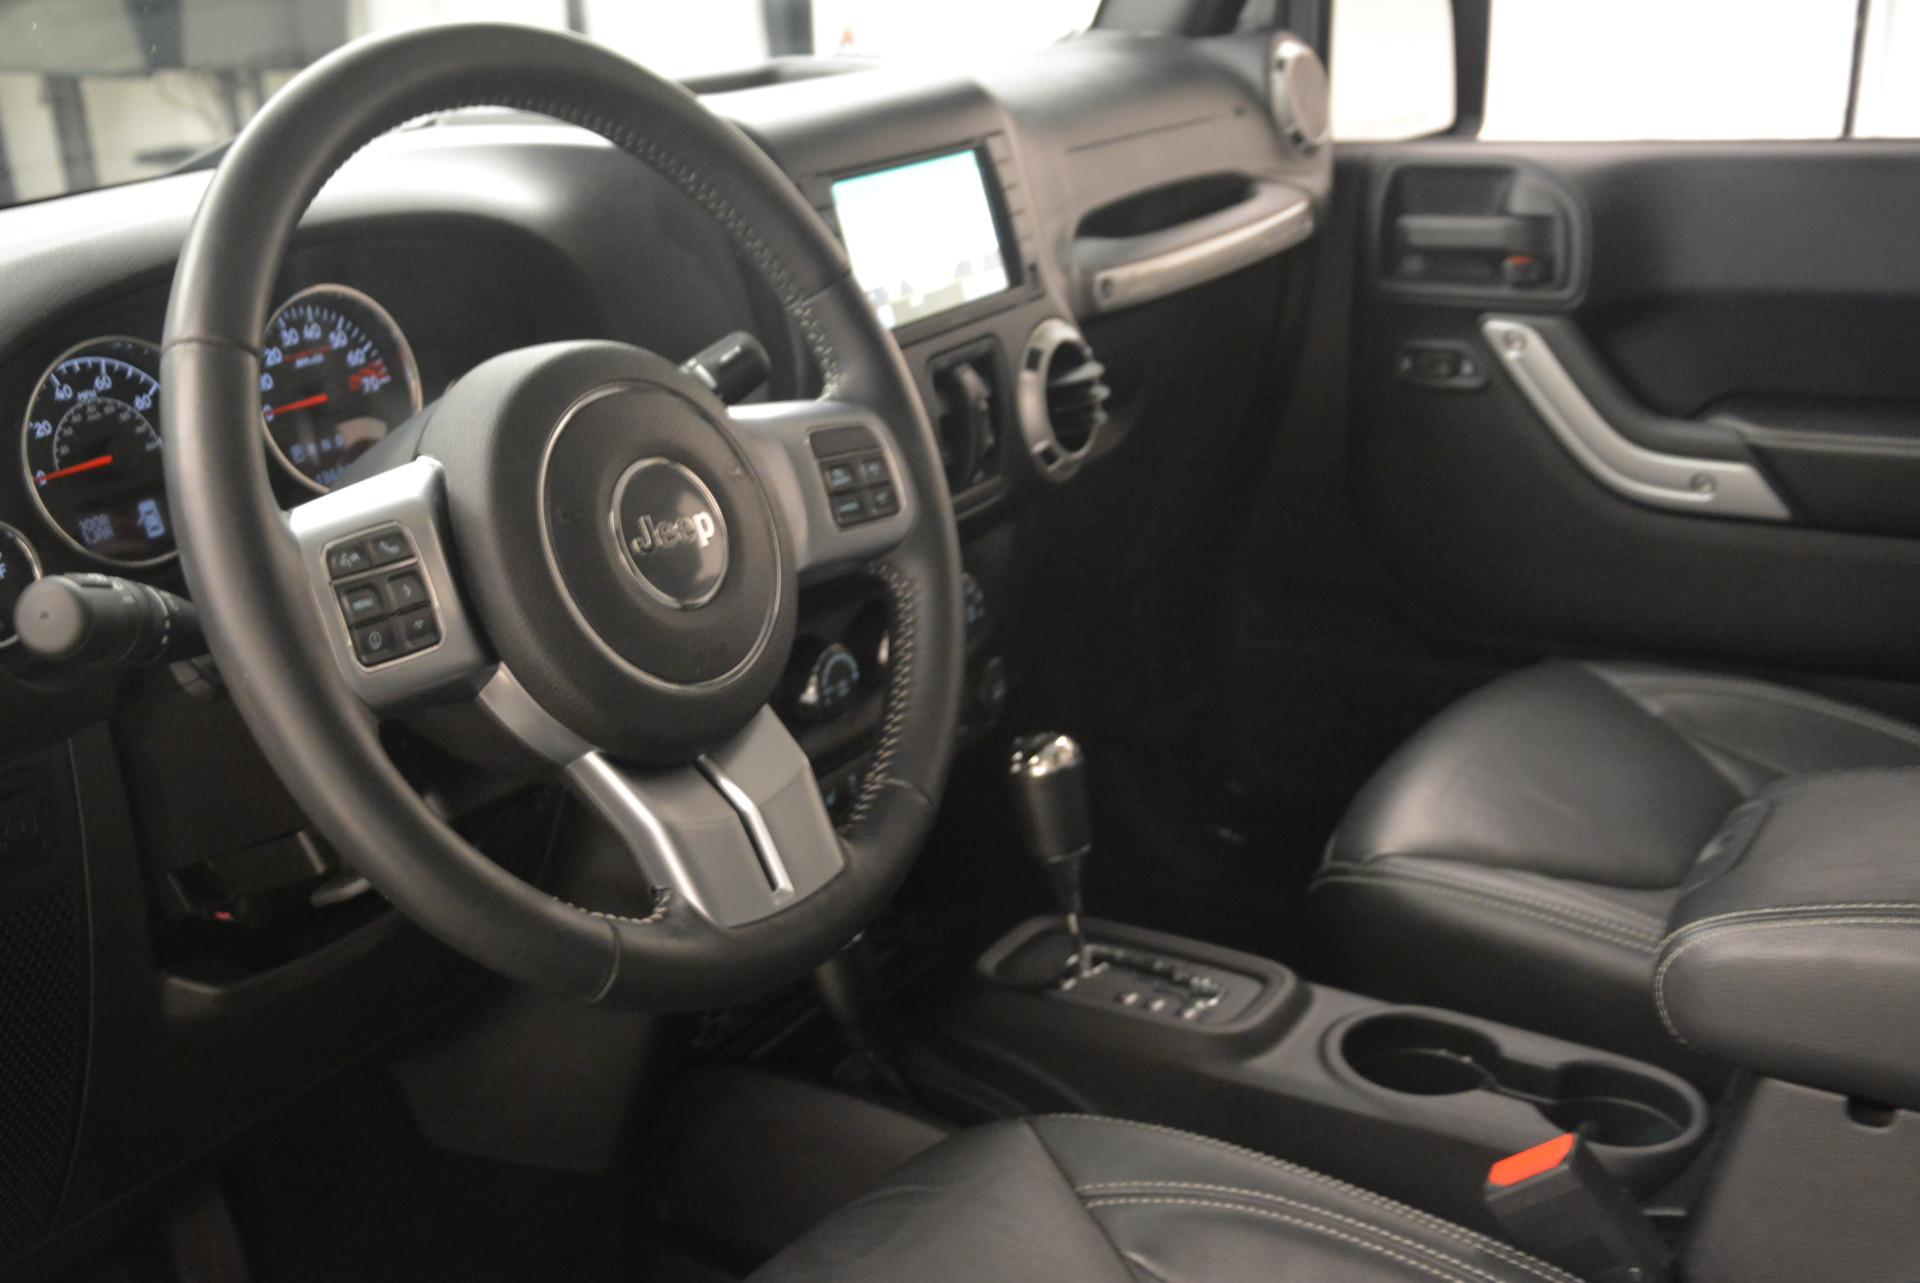 Used 2016 Jeep Wrangler Unlimited Rubicon For Sale In Greenwich, CT. Alfa Romeo of Greenwich, 7345A 2218_p13